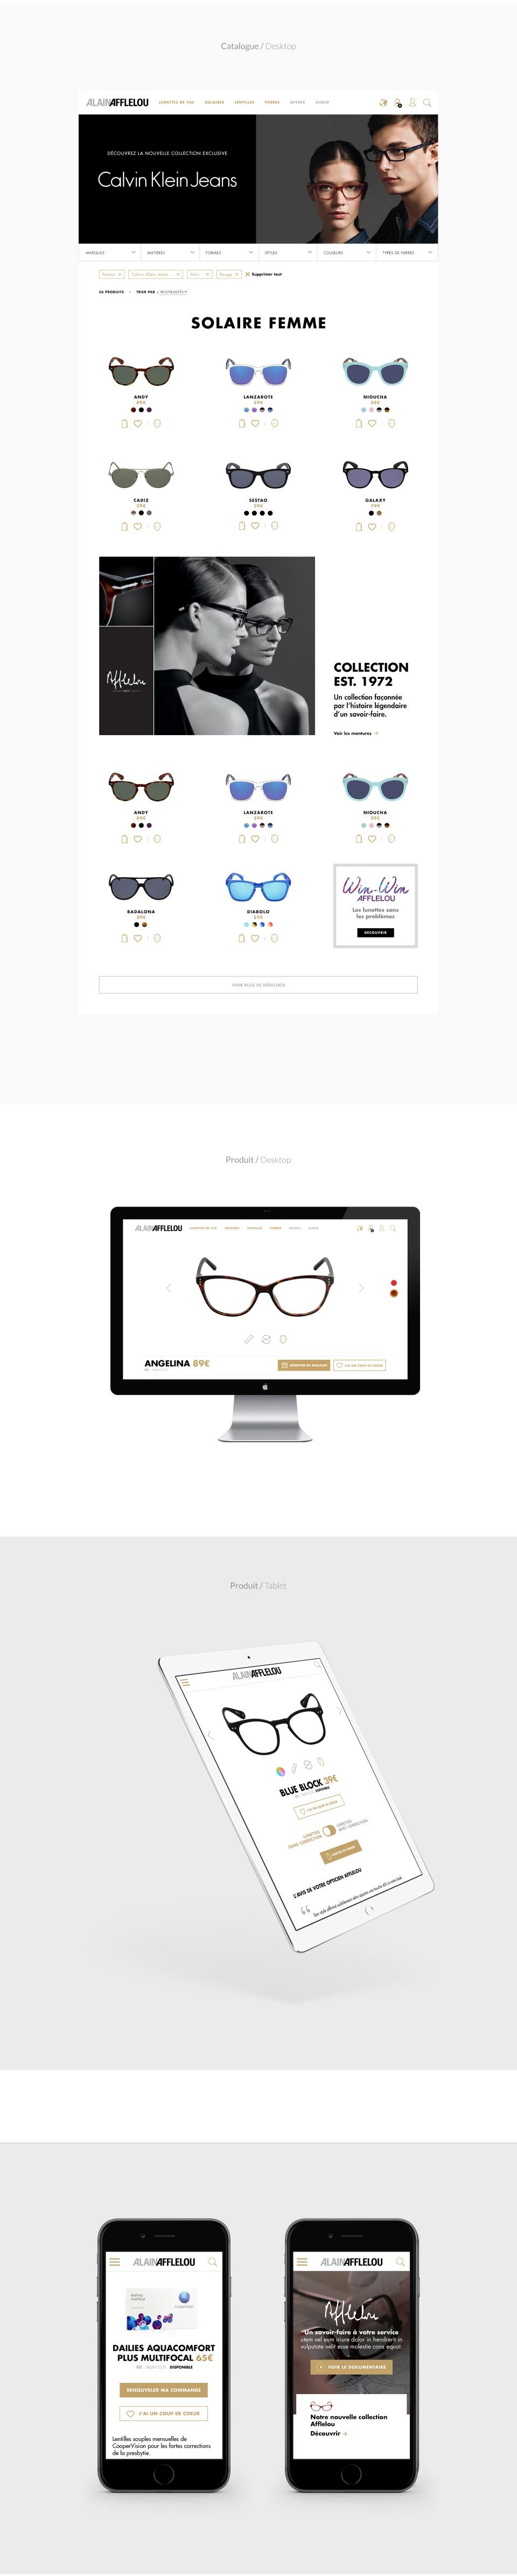 Alain Afflelou - Web Design - UX/UI design